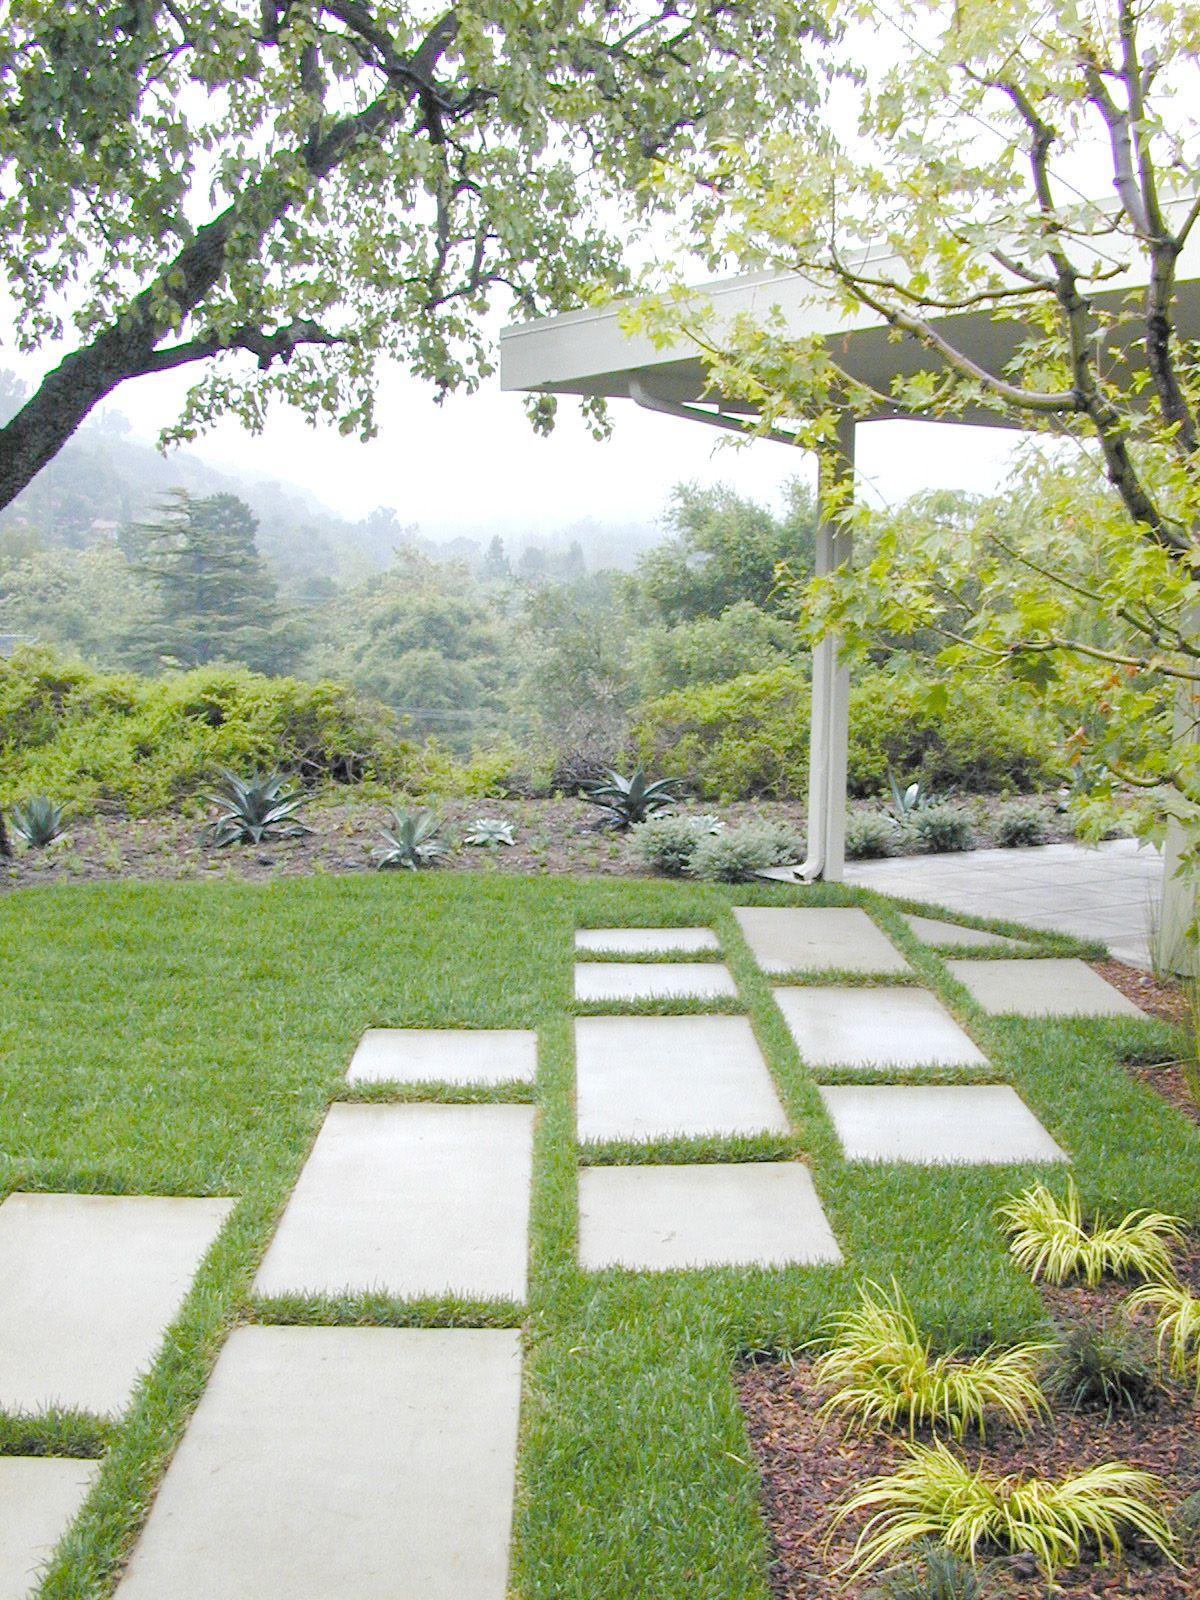 Concrete Rectangular Pavers Modern Landscaping Modern Garden Landscape Design